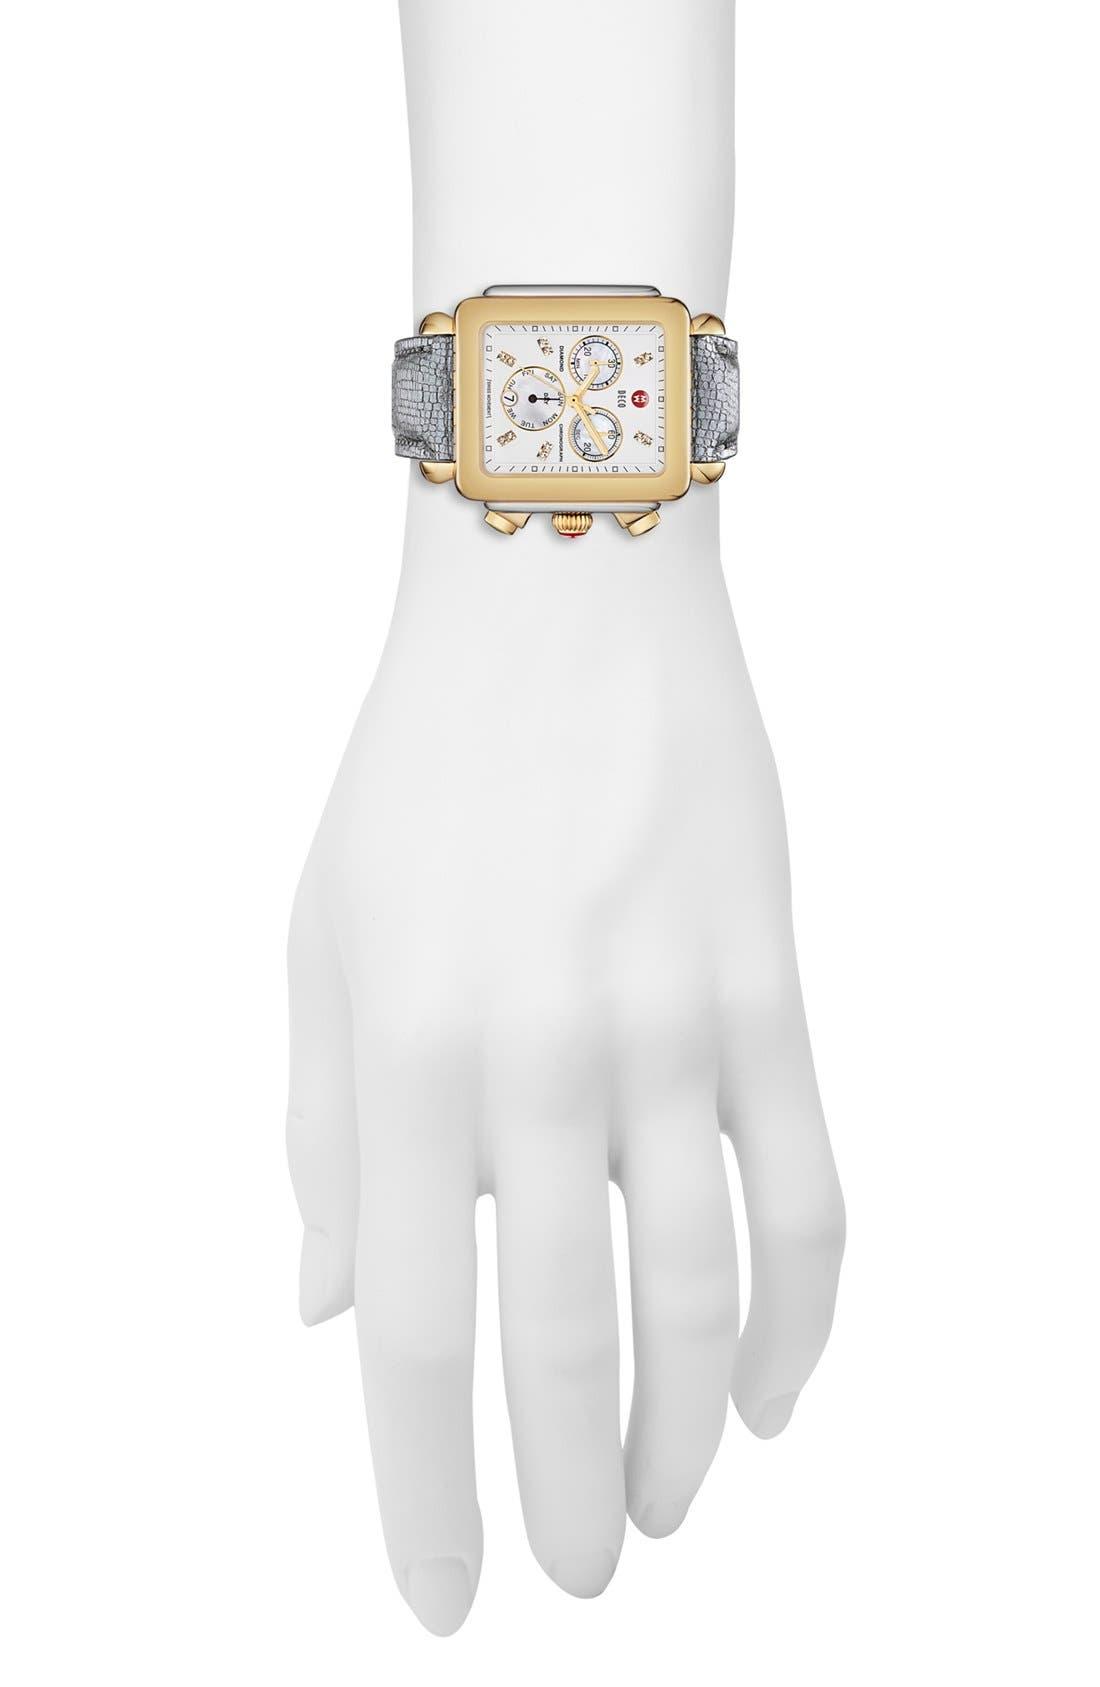 Alternate Image 2  - MICHELE 'Deco XL' Diamond Dial Watch Case, 37mm x 38mm